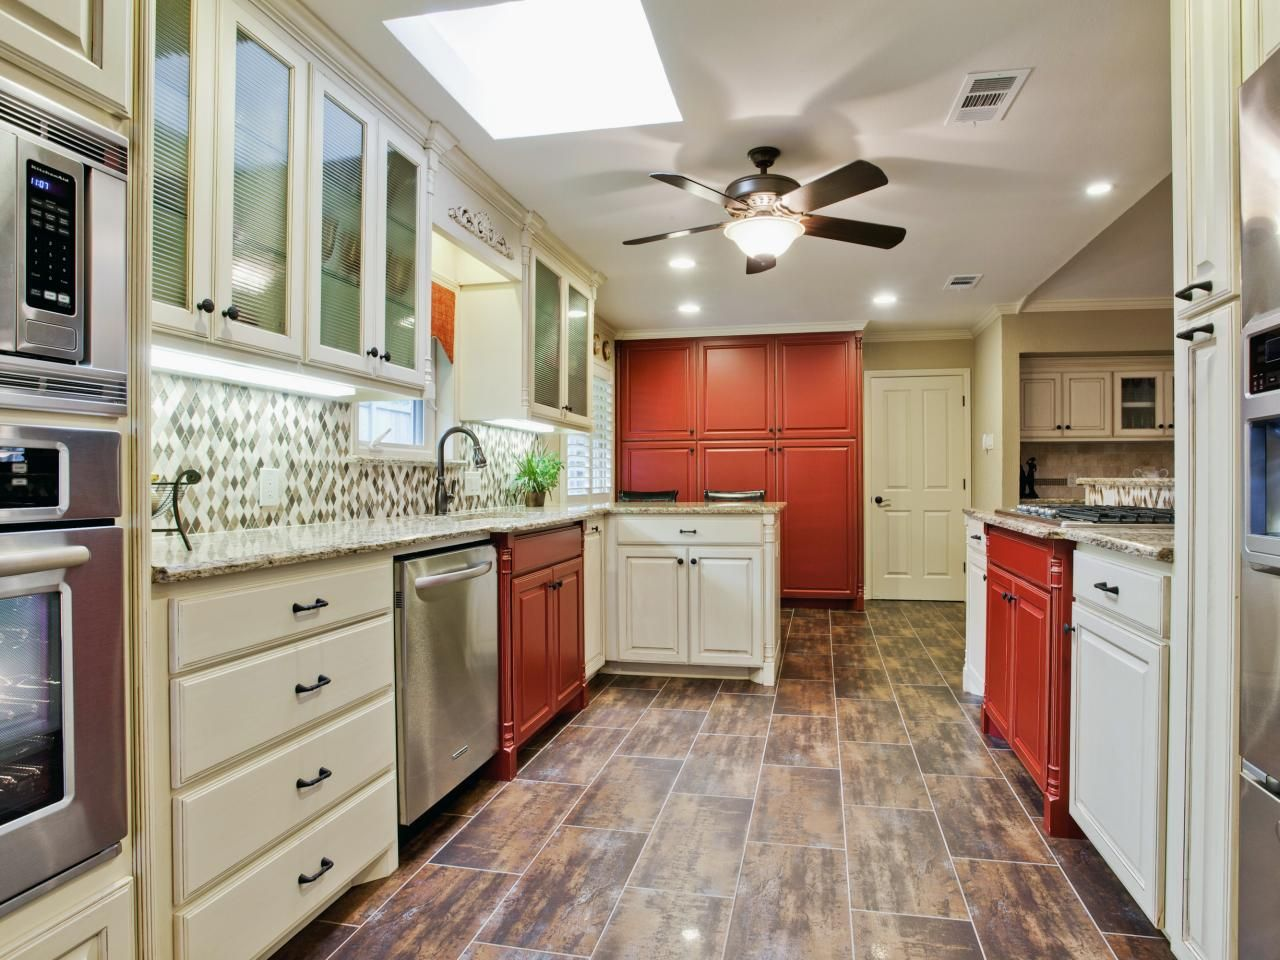 best way to paint kitchen cabinets hgtv pictures ideas kitchen design outdoor kitchen on kitchen cabinet color ideas id=42780